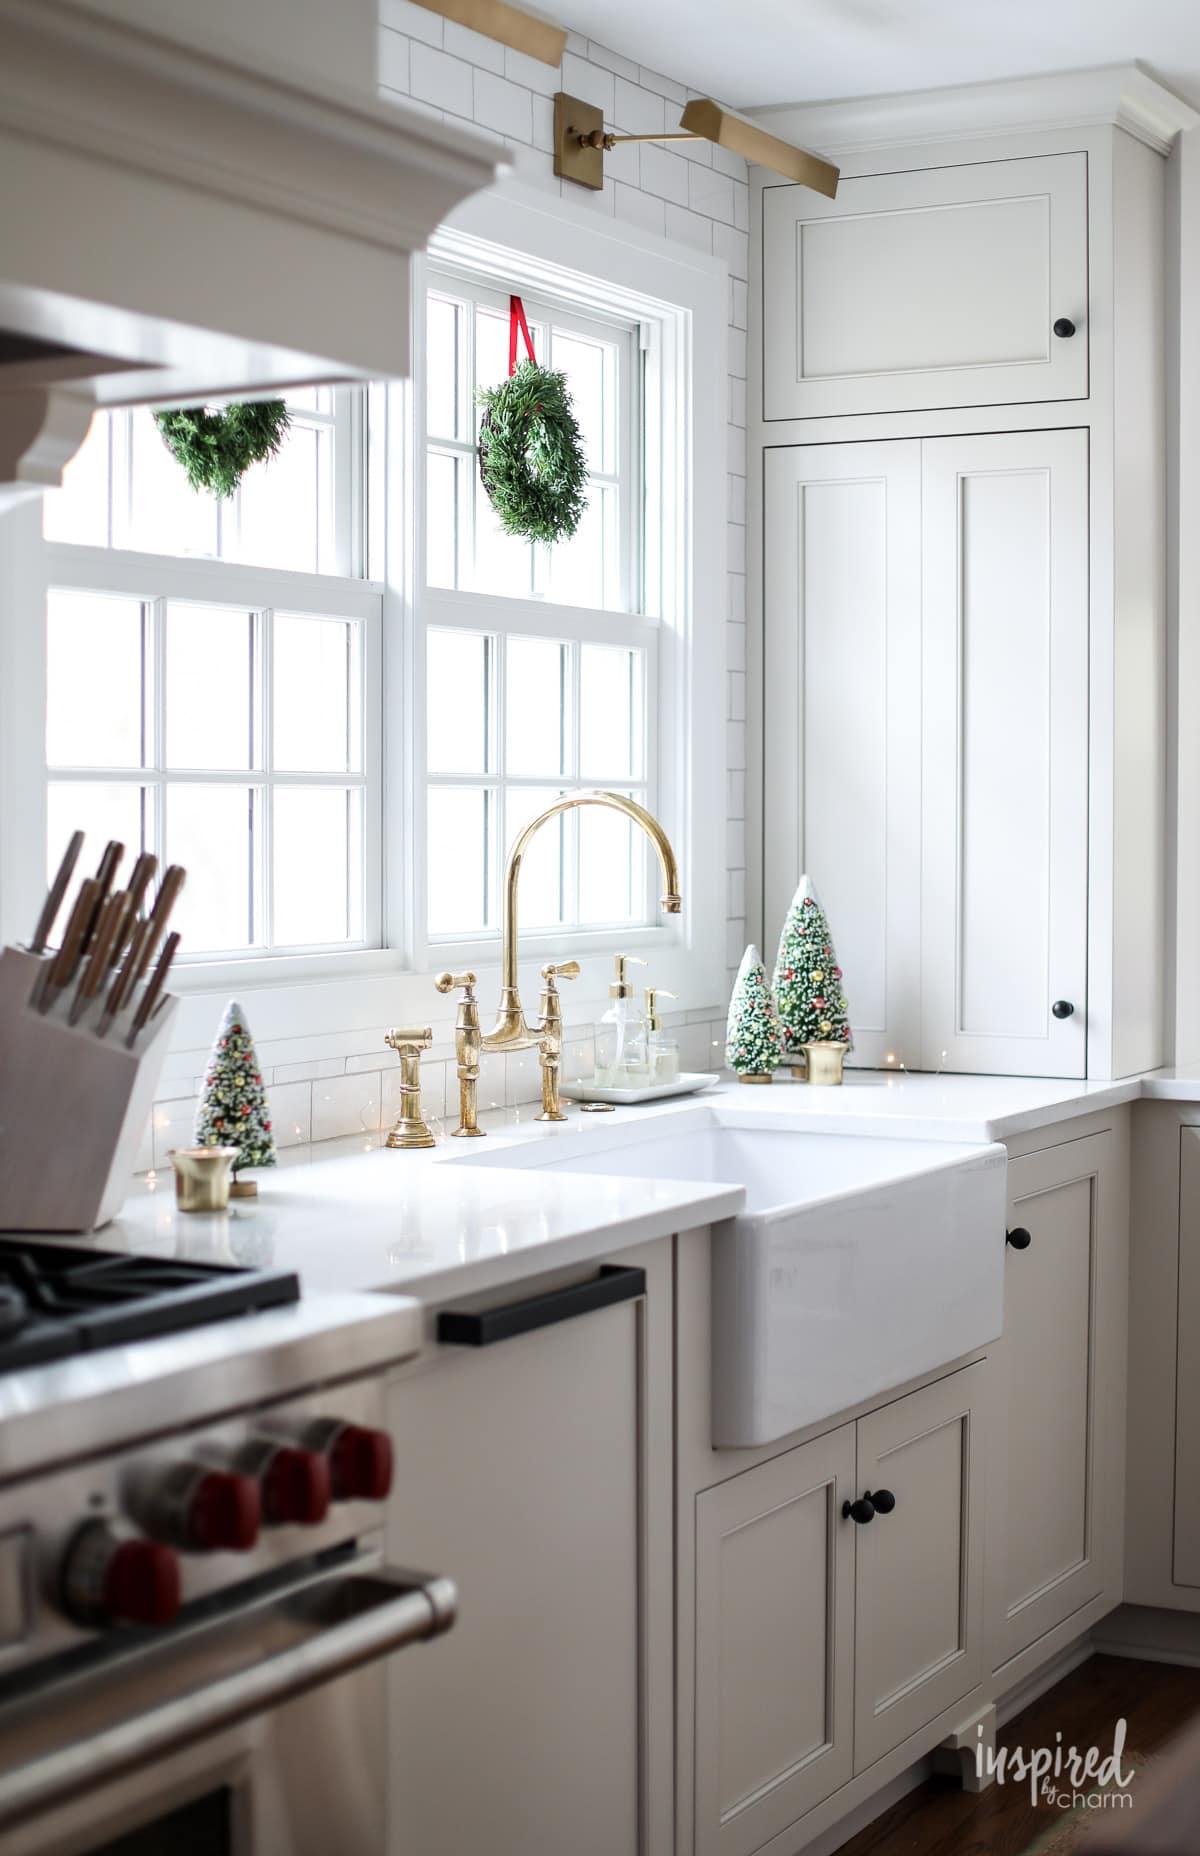 Festive Christmas Kitchen Decor Ideas and Inspiration